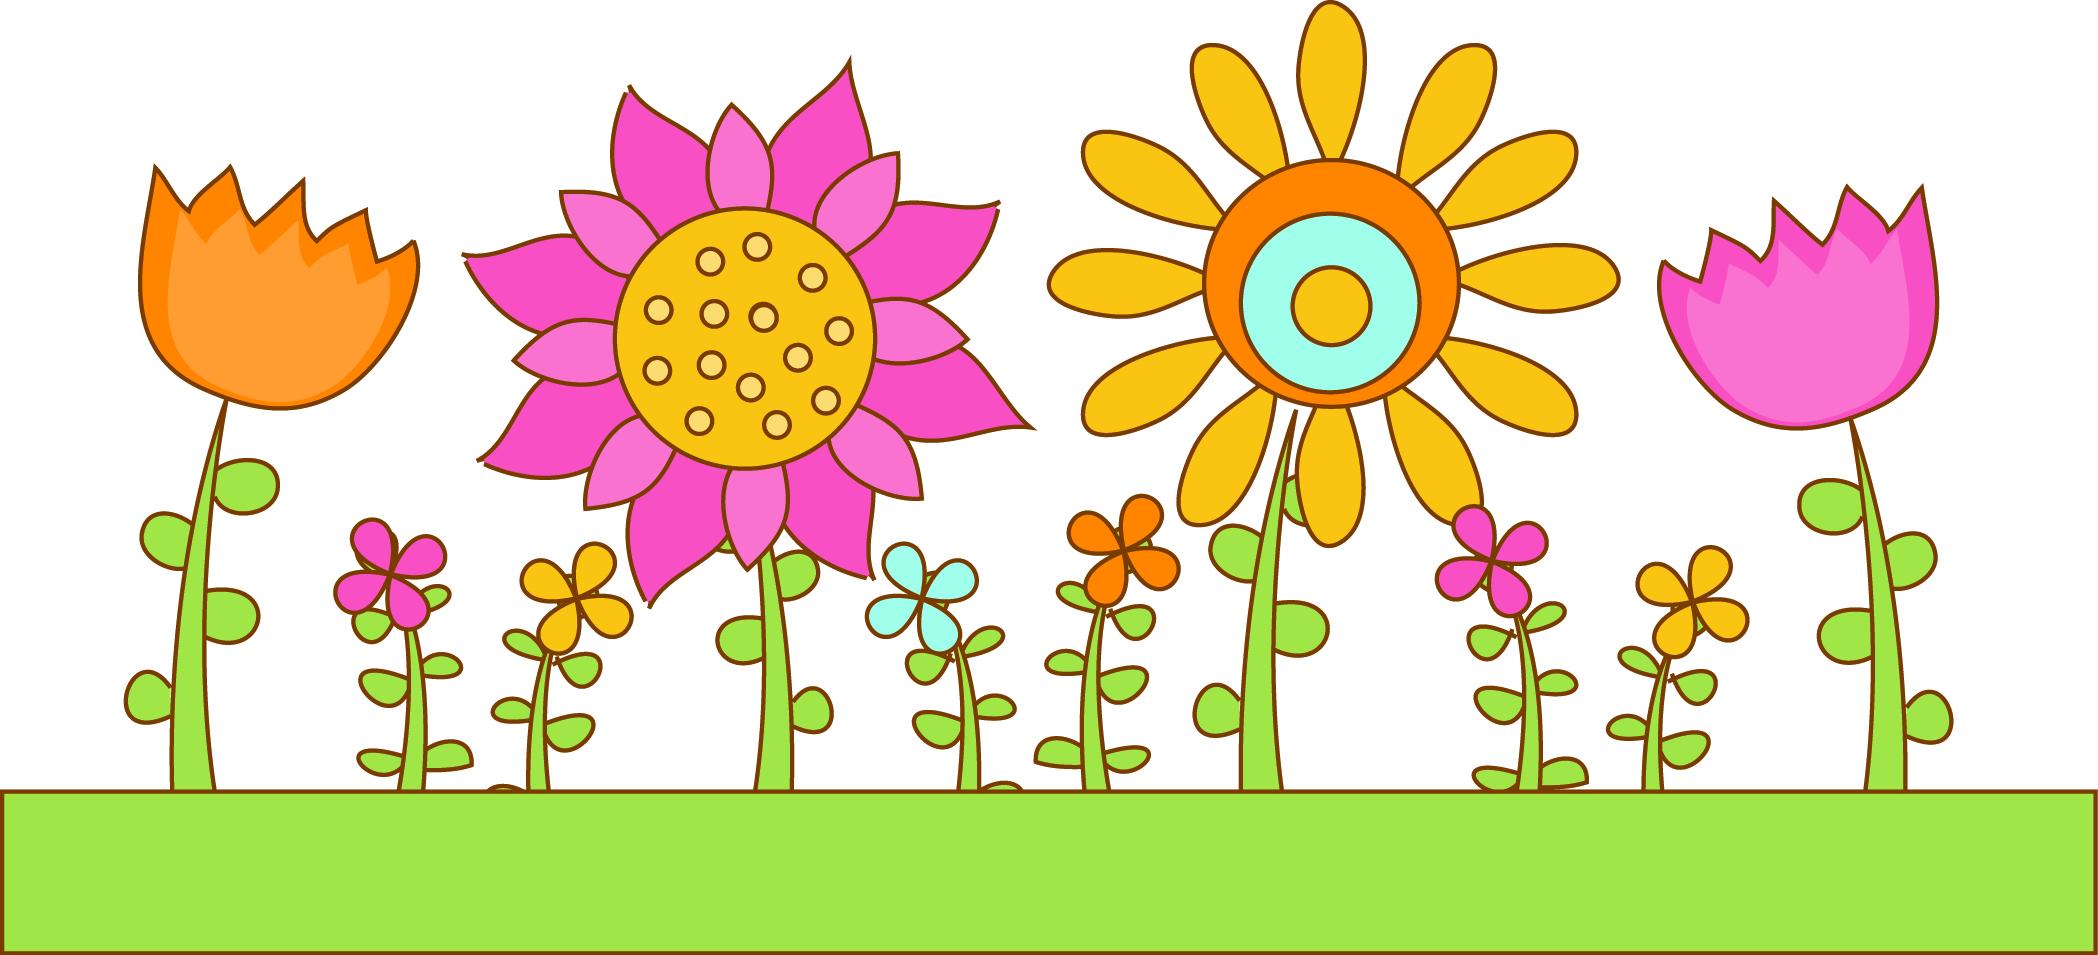 Garden clipart #4, Download drawings